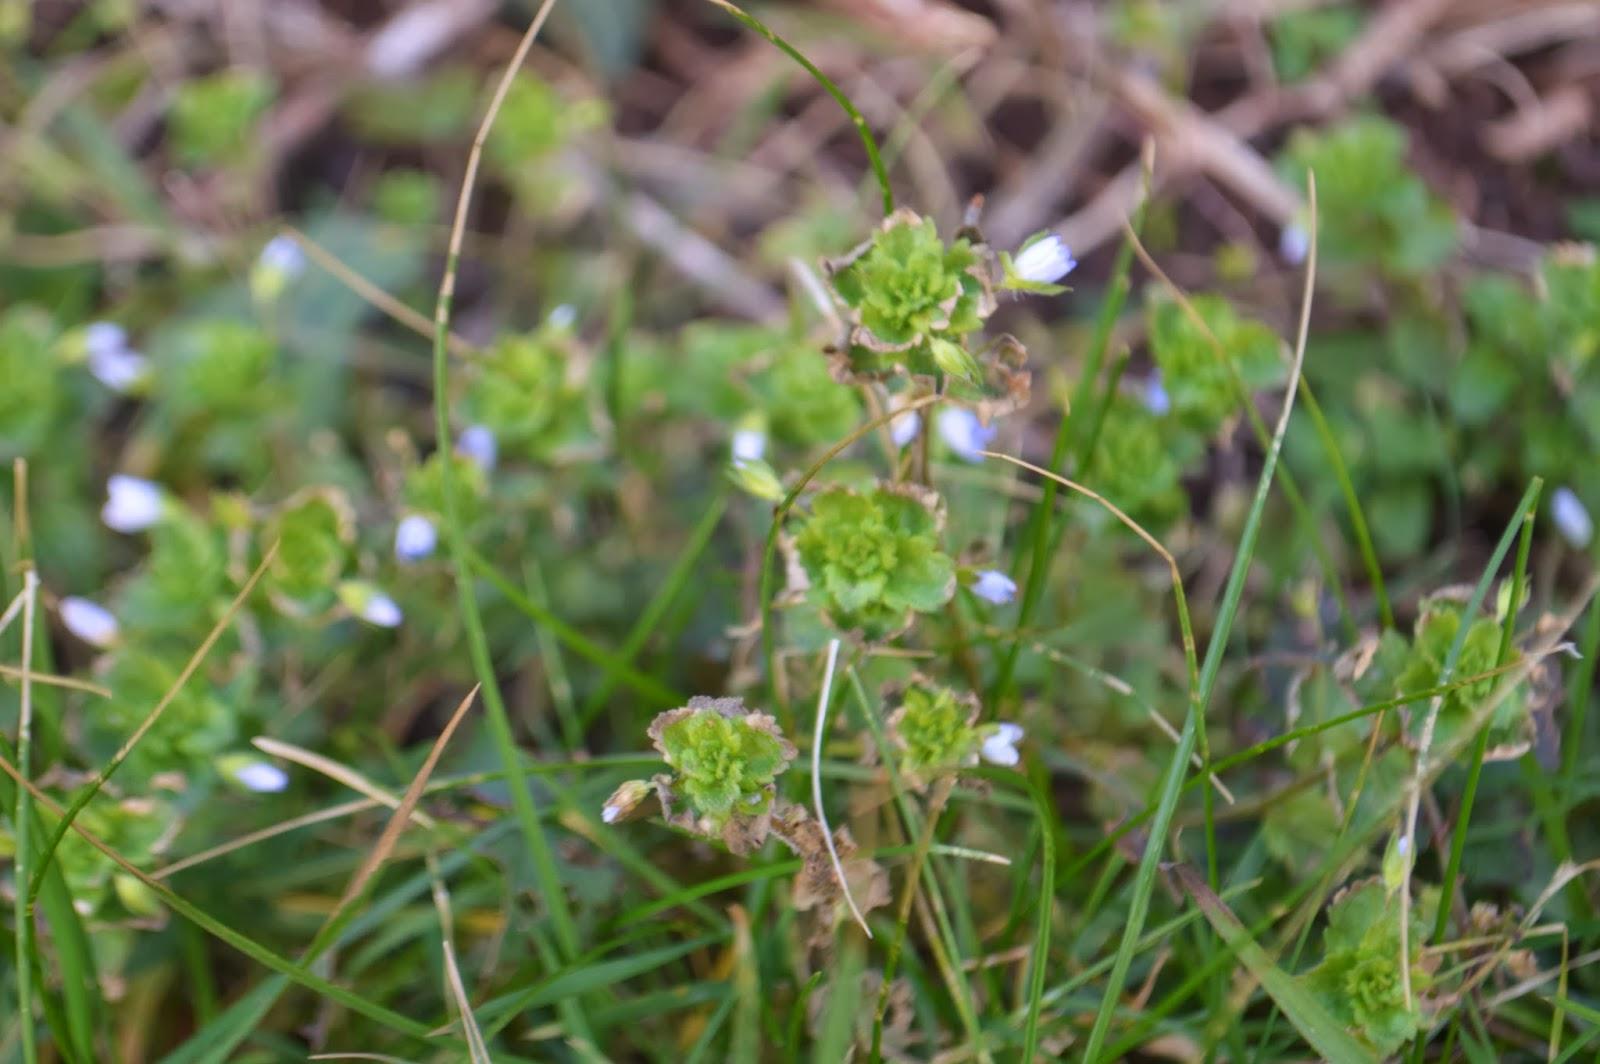 weed flower garden Hakin Pembrokeshire Wales